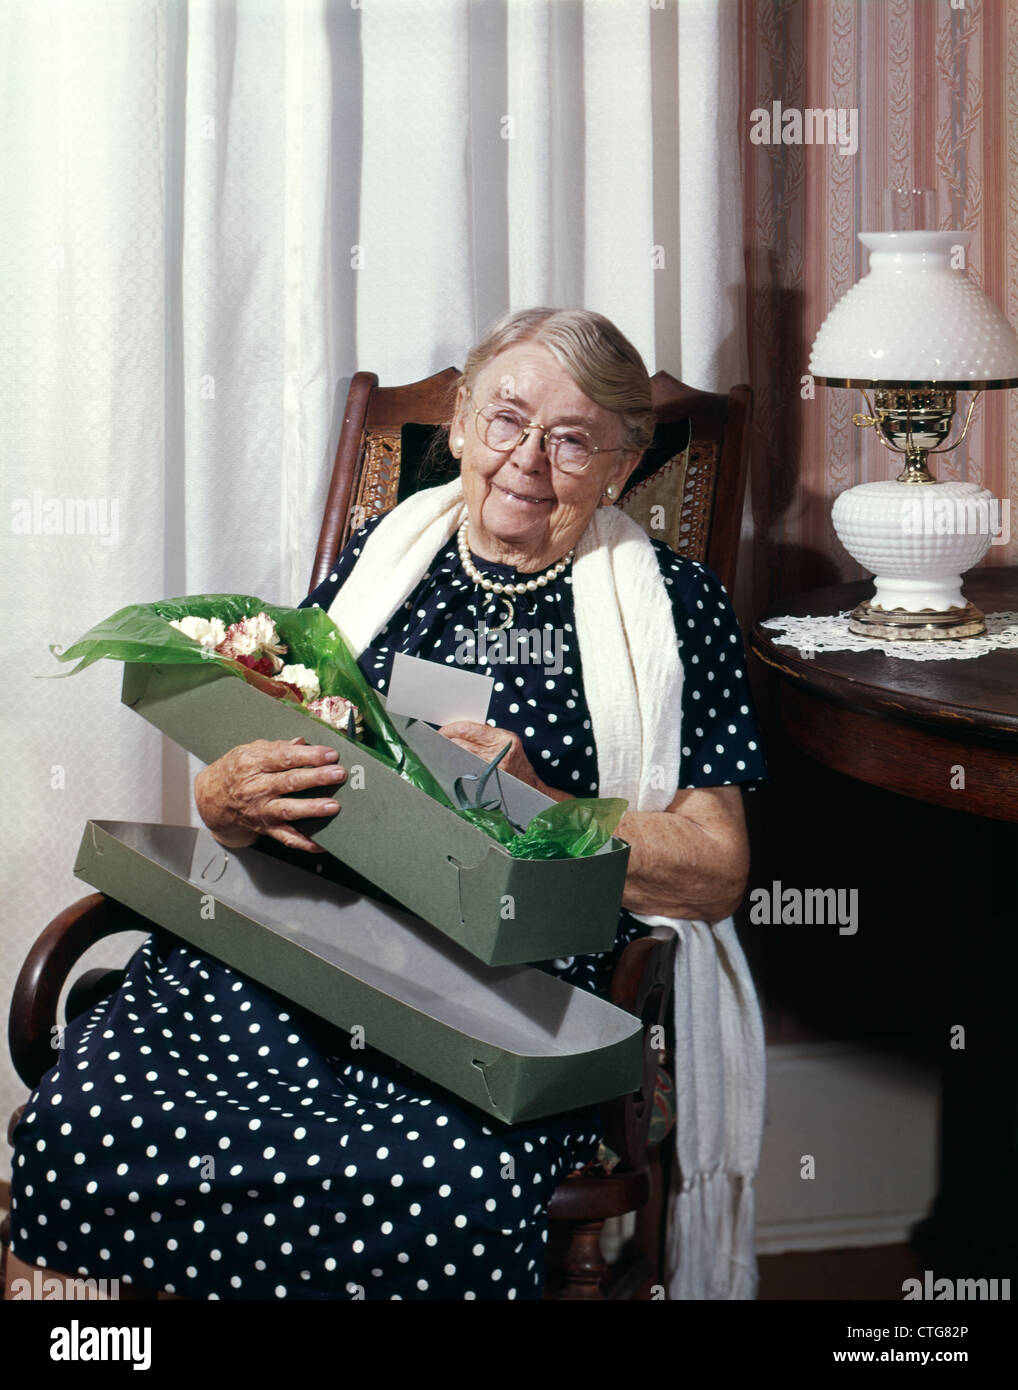 S smiling senior elderly old lady grandma granny